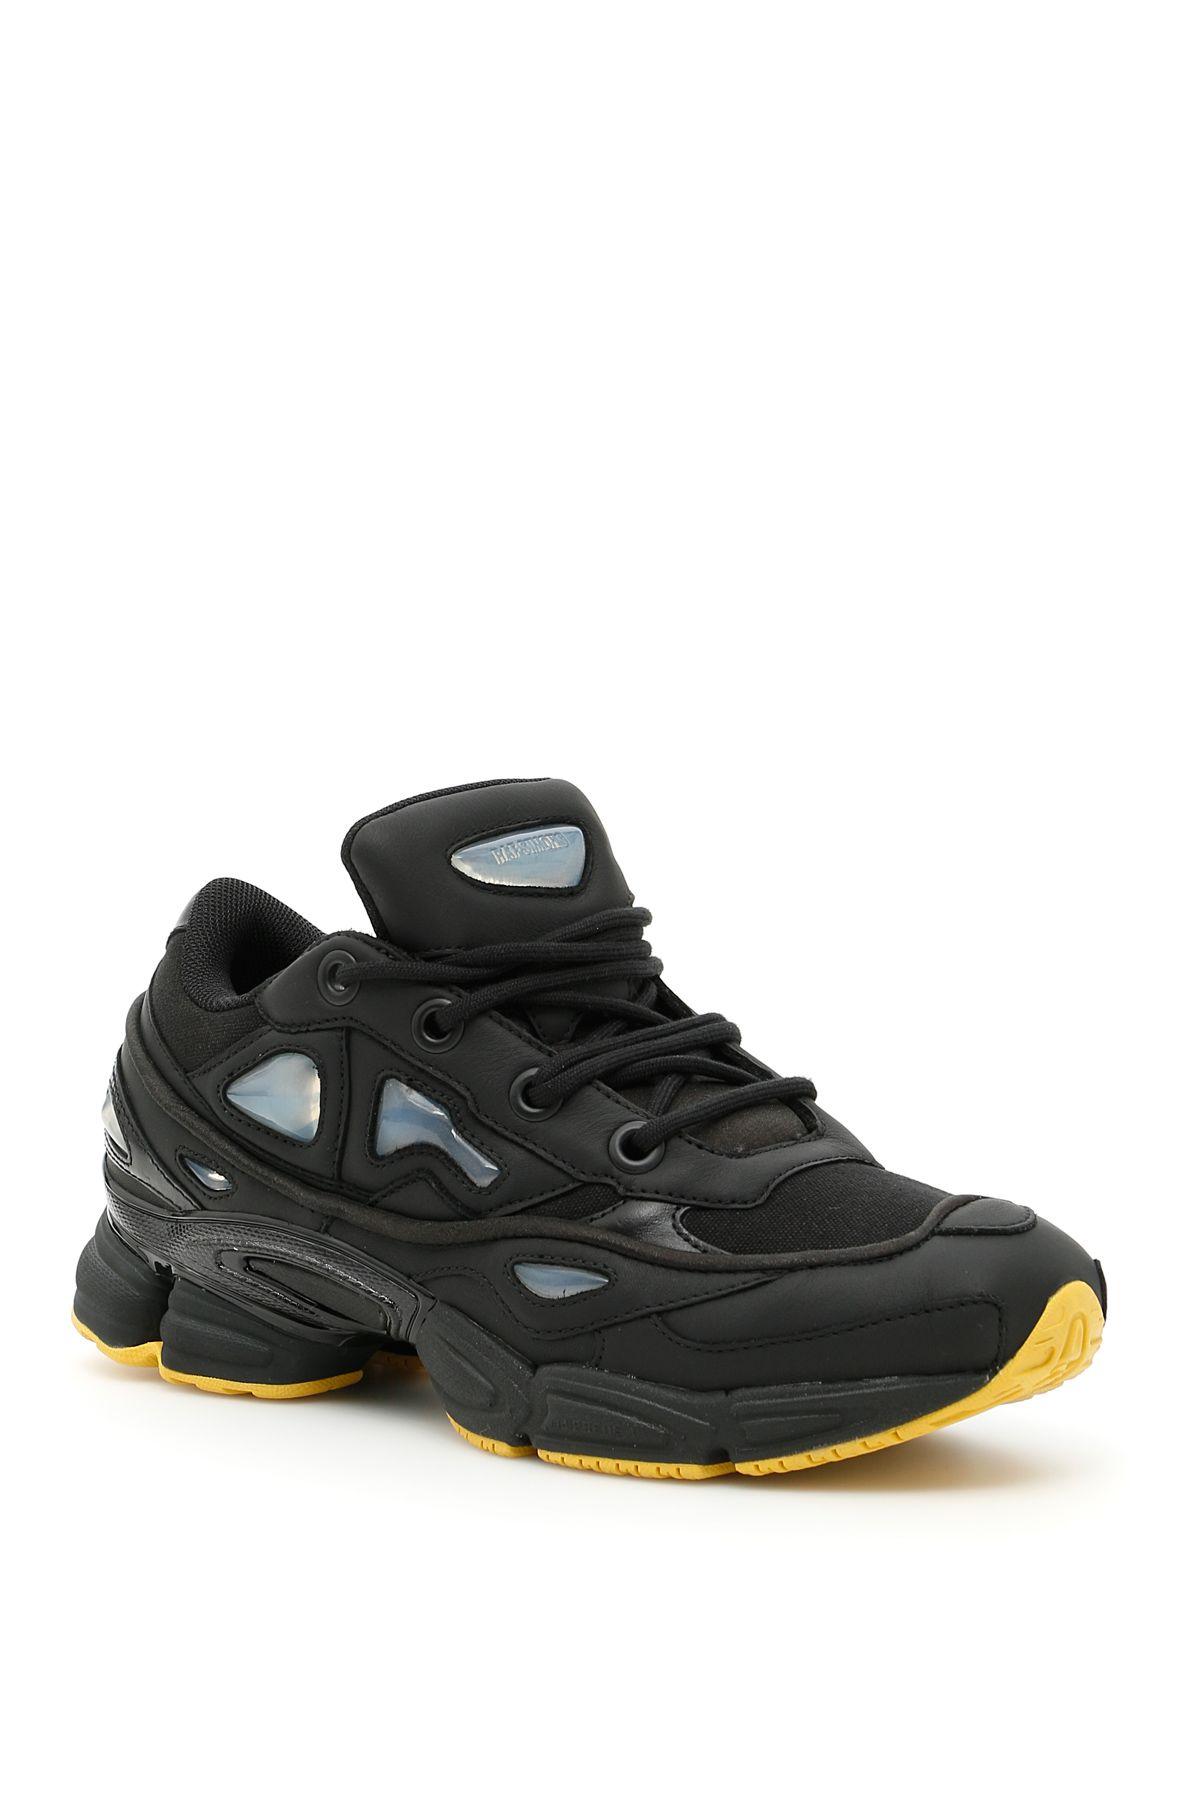 adidas by raf simons raf simons ozweego iii sneakers. Black Bedroom Furniture Sets. Home Design Ideas